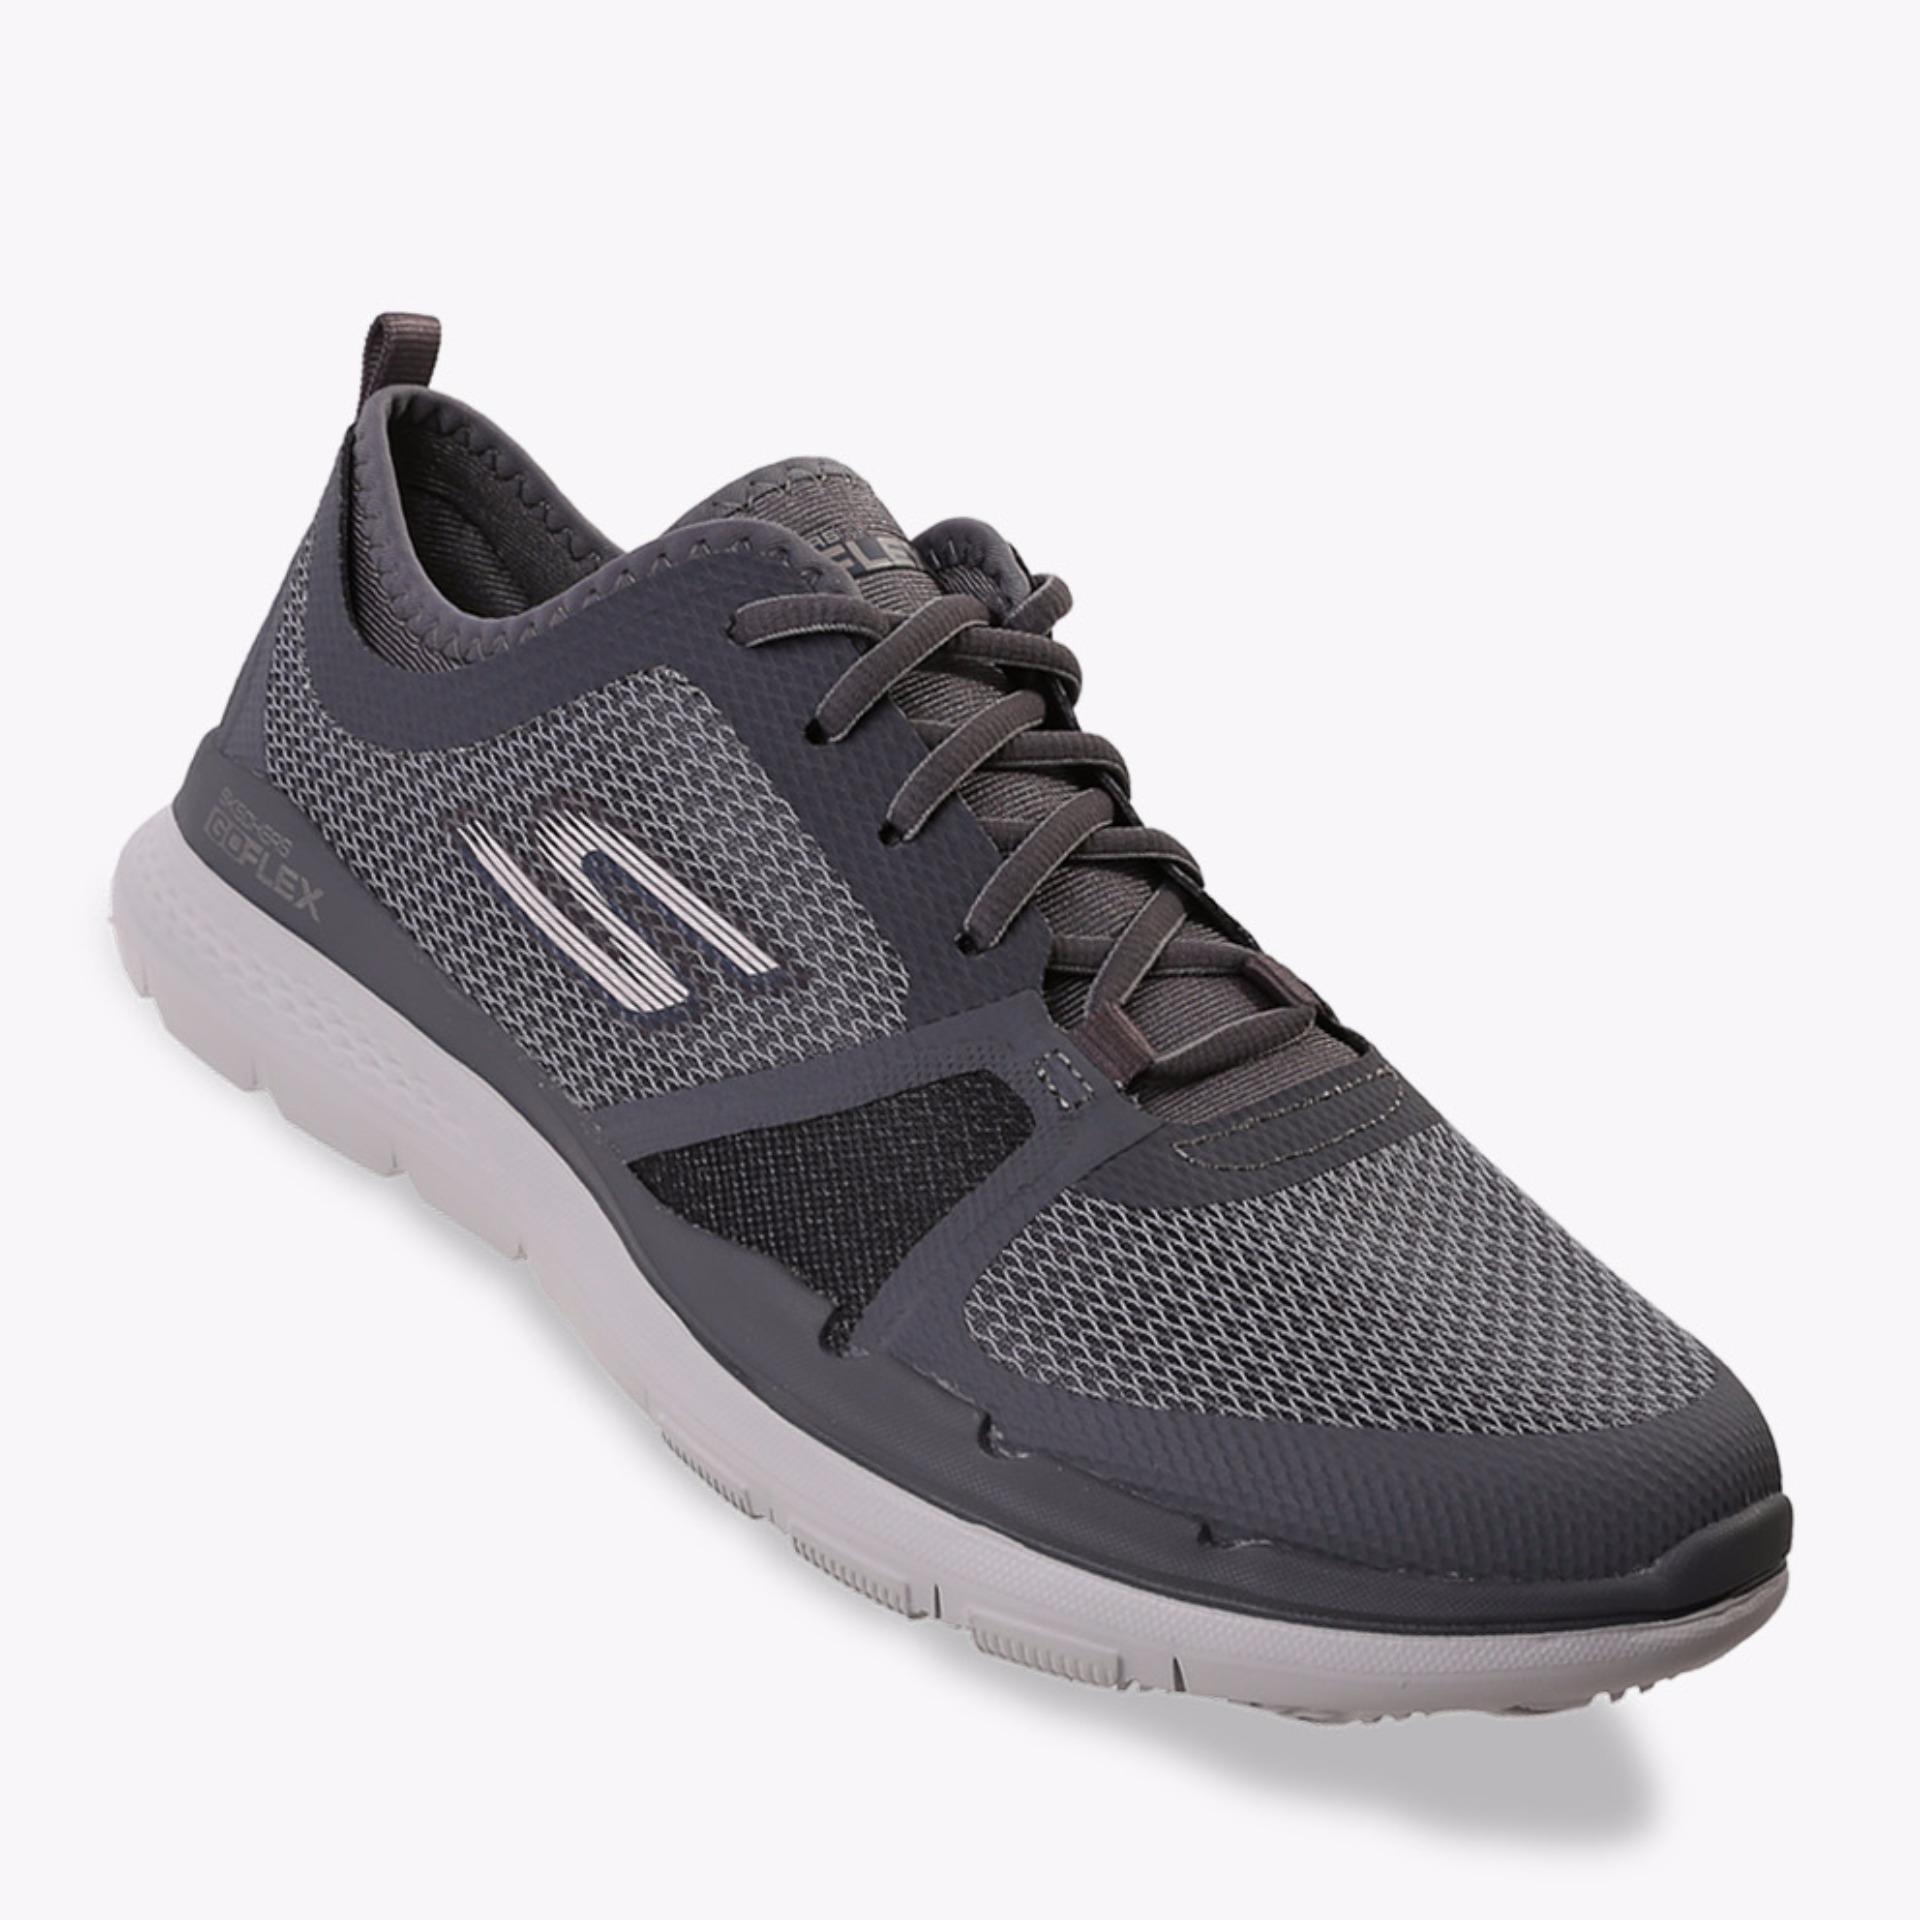 Jual Skechers Go Flex Train Conquer Men S Sneakers Shoes Abu Abu Baru